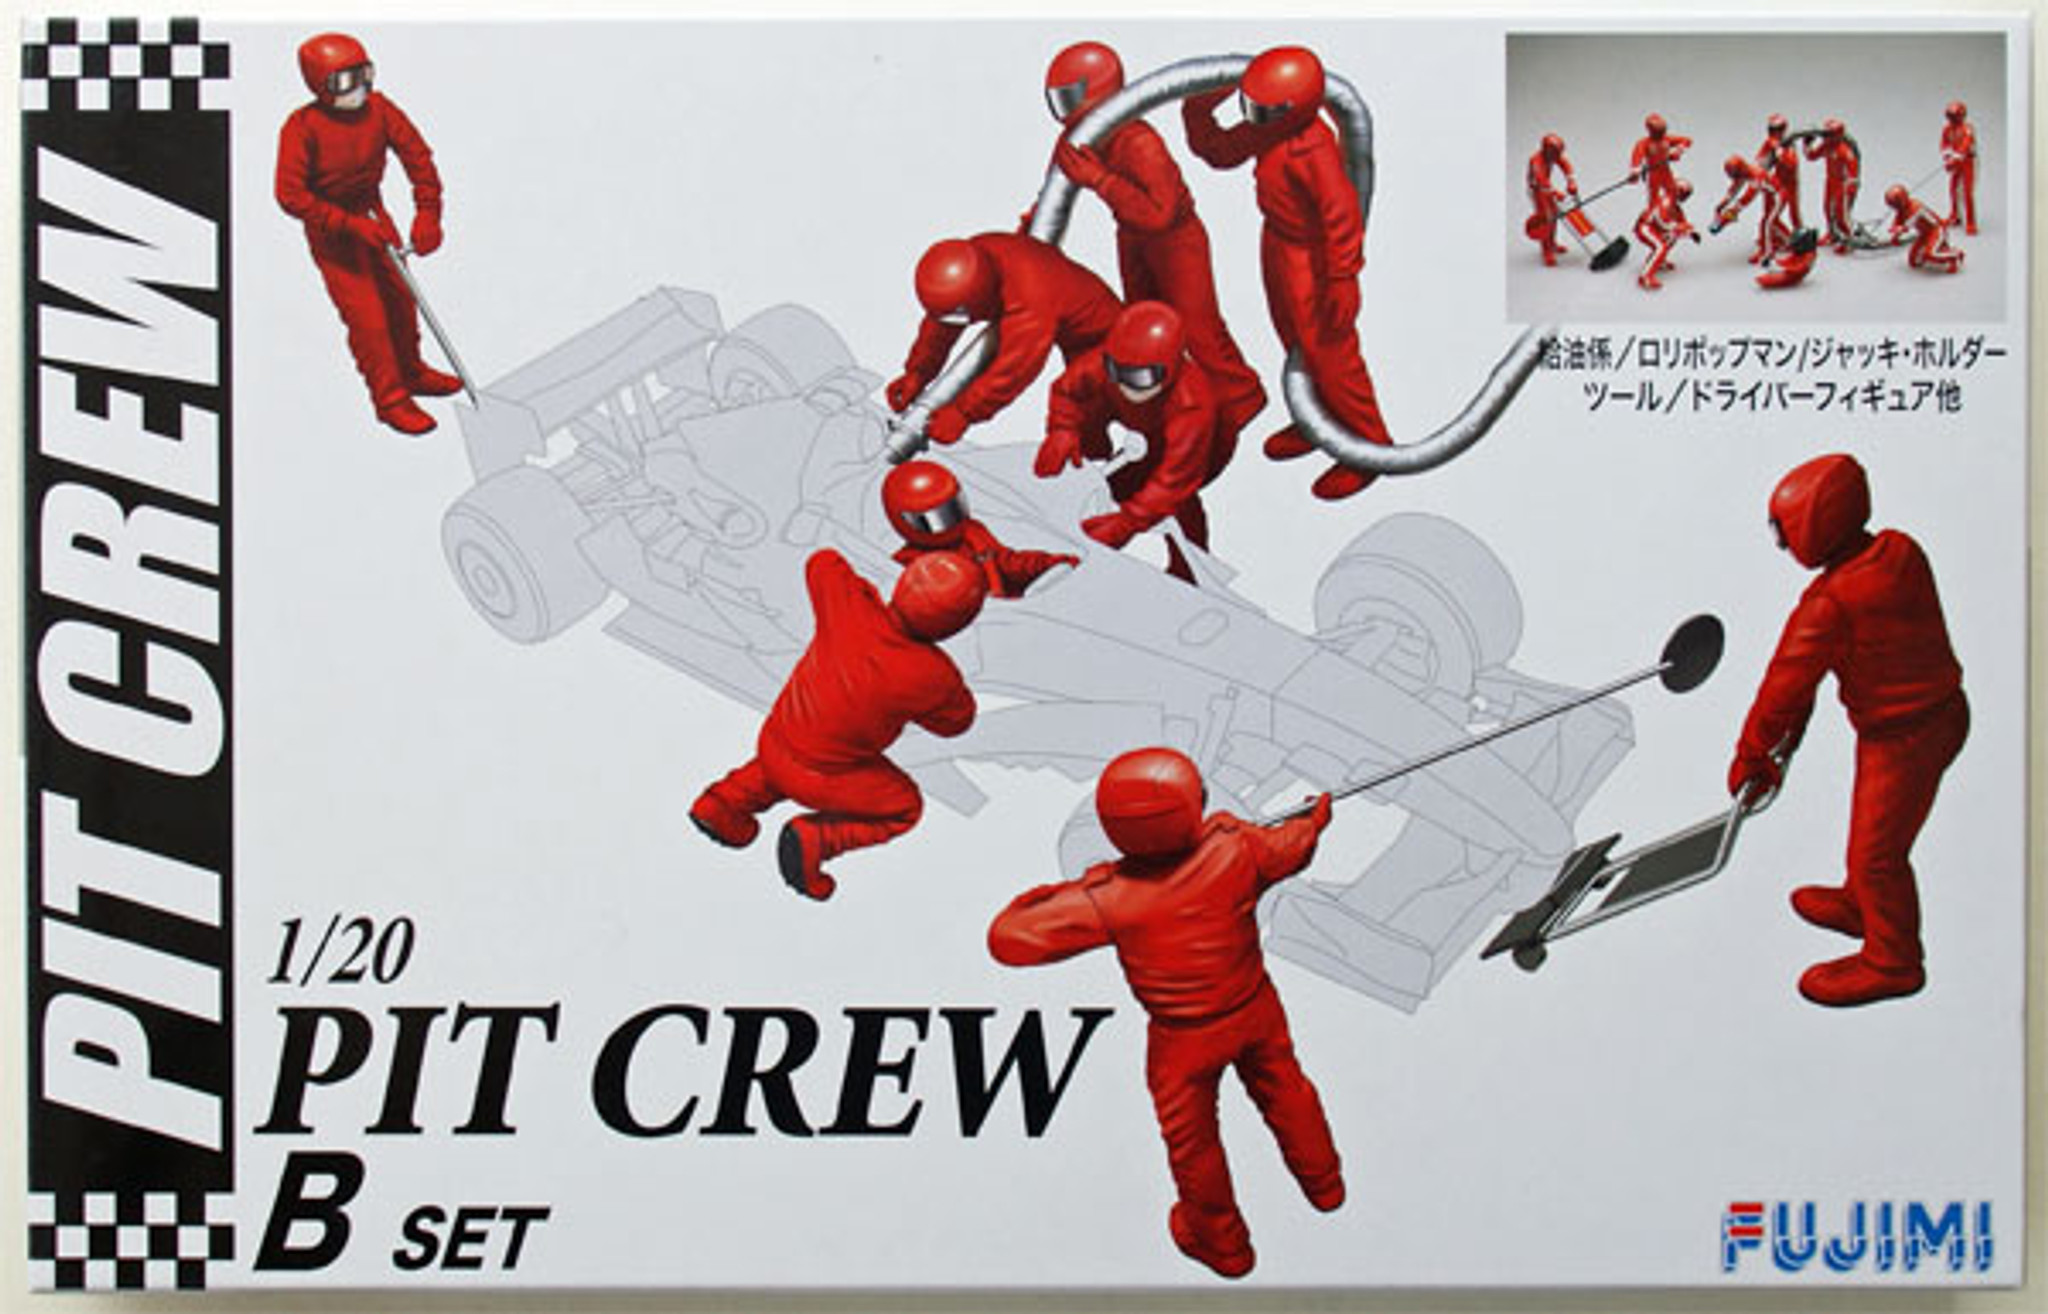 Fujimi GT21 112459 Pit Crew Set B 1/20 Scale Kit (GARAGE